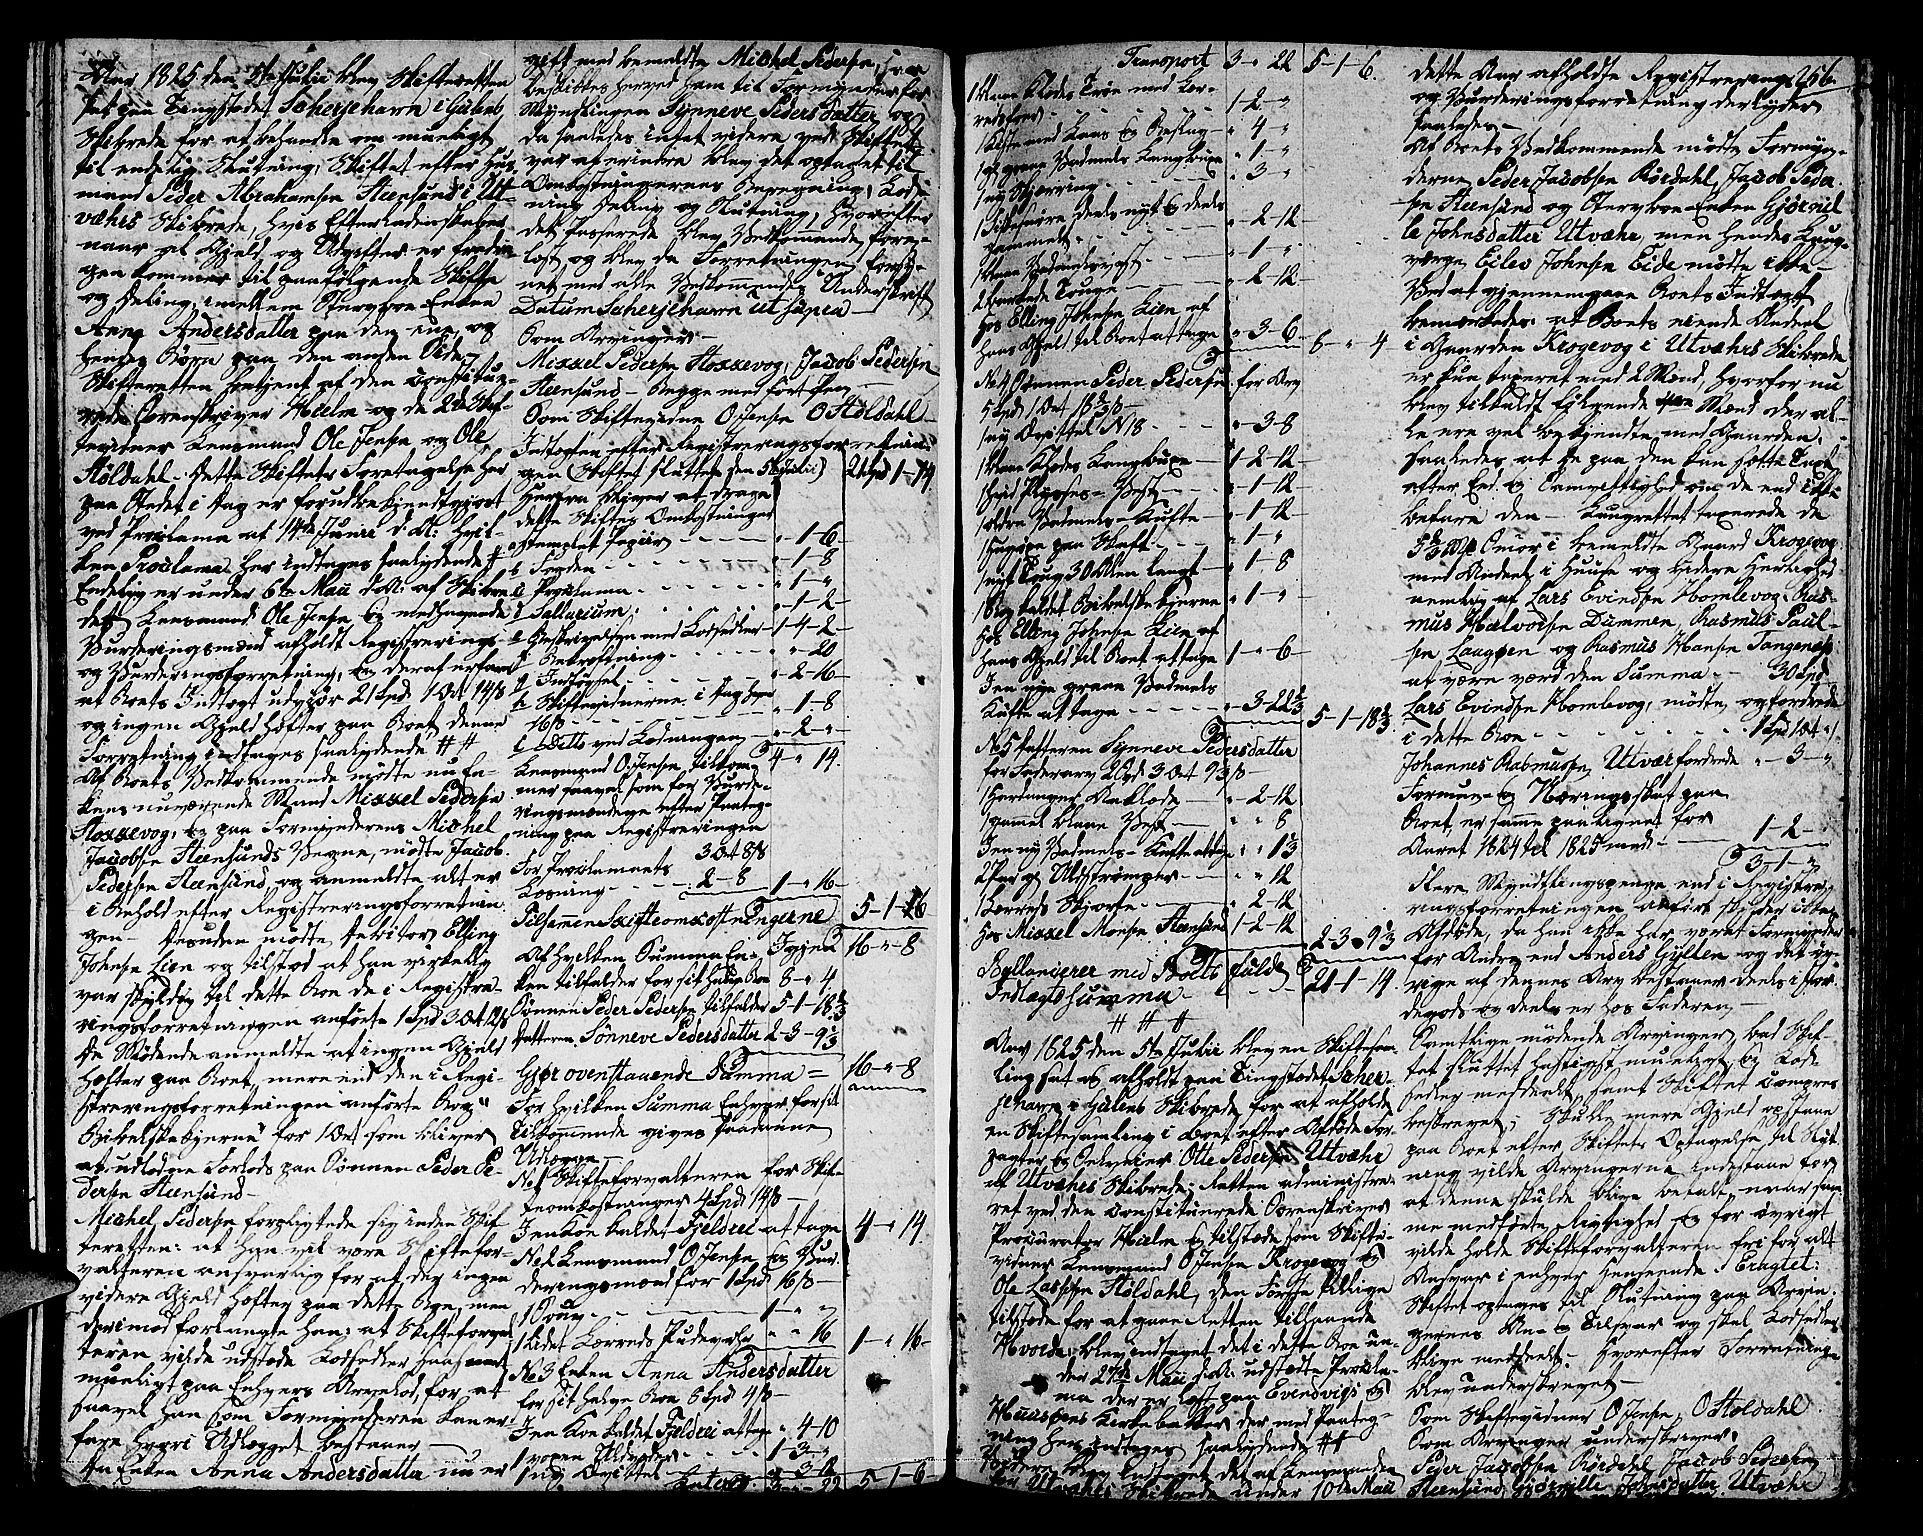 SAB, Ytre Sogn Tingrett, H/Ha/L0017: Skifteprotokoll, 1813-1828, s. 255b-256a